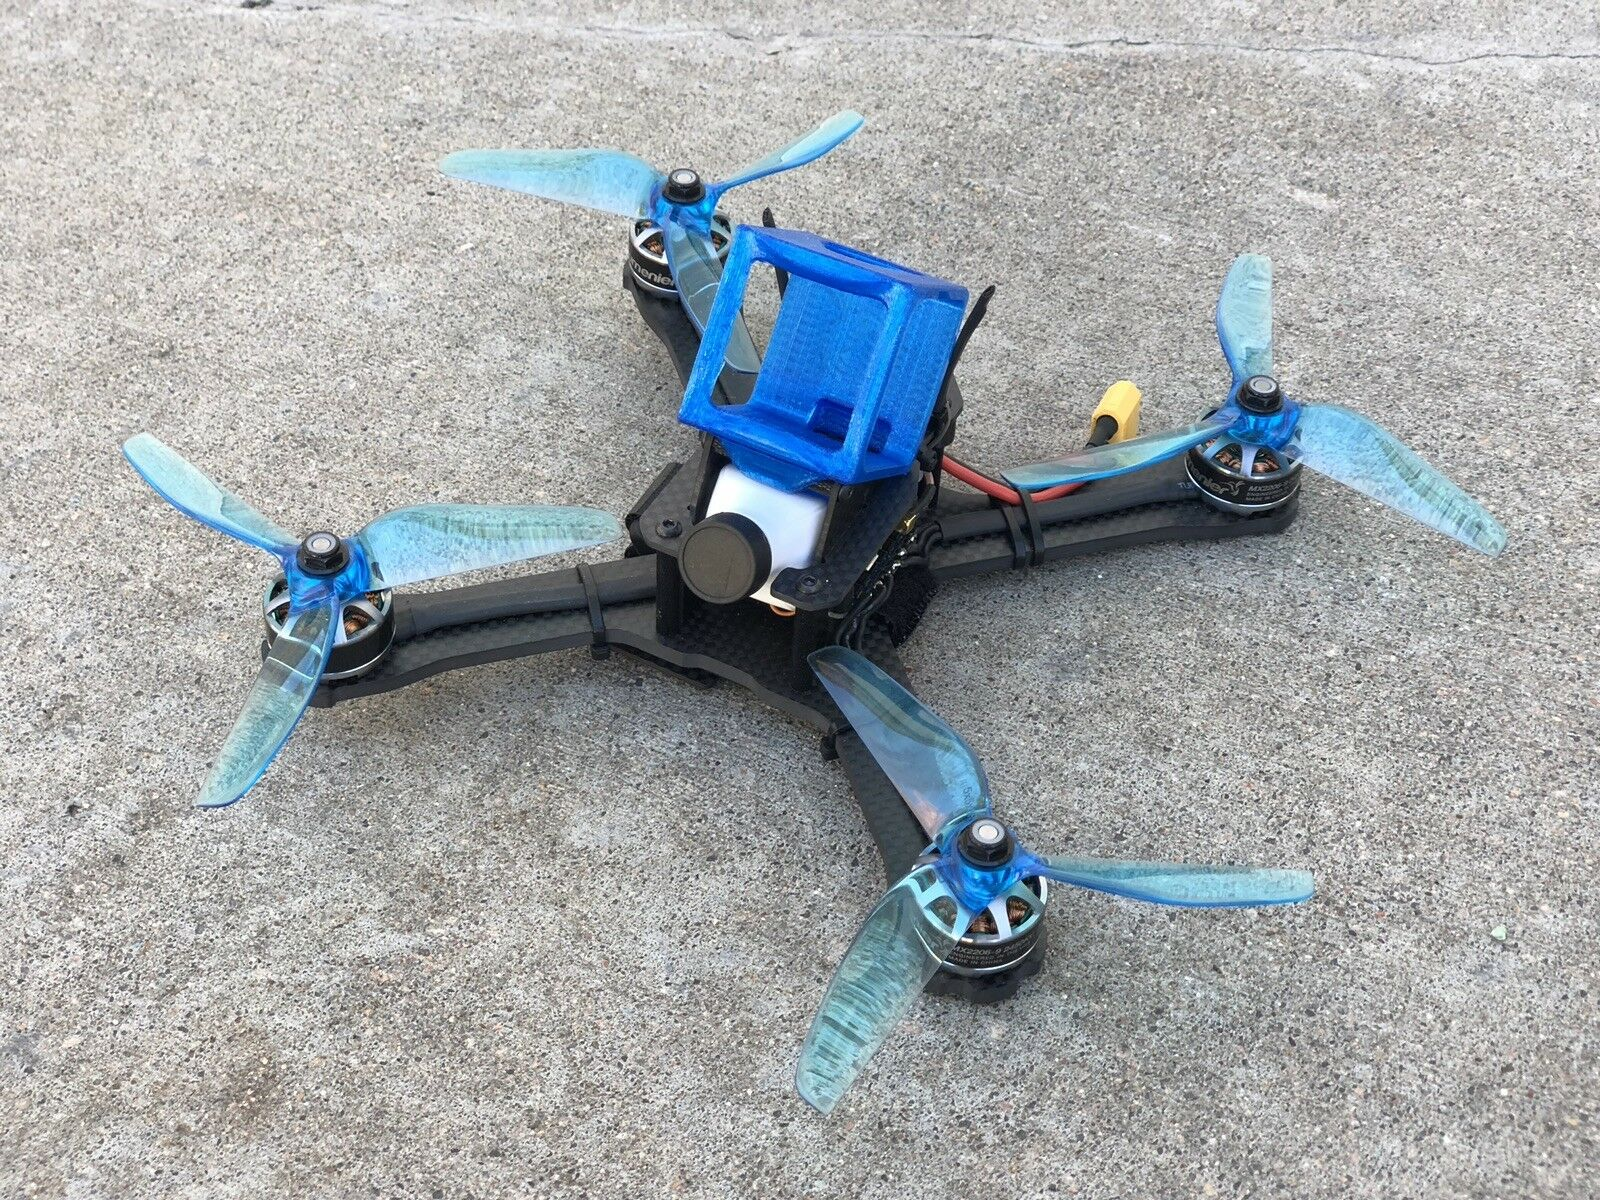 QAV-X CHARPU FPV Racing Quadcopter (4mm) RTF w  DSMX DSMX DSMX Rx d9fdf7